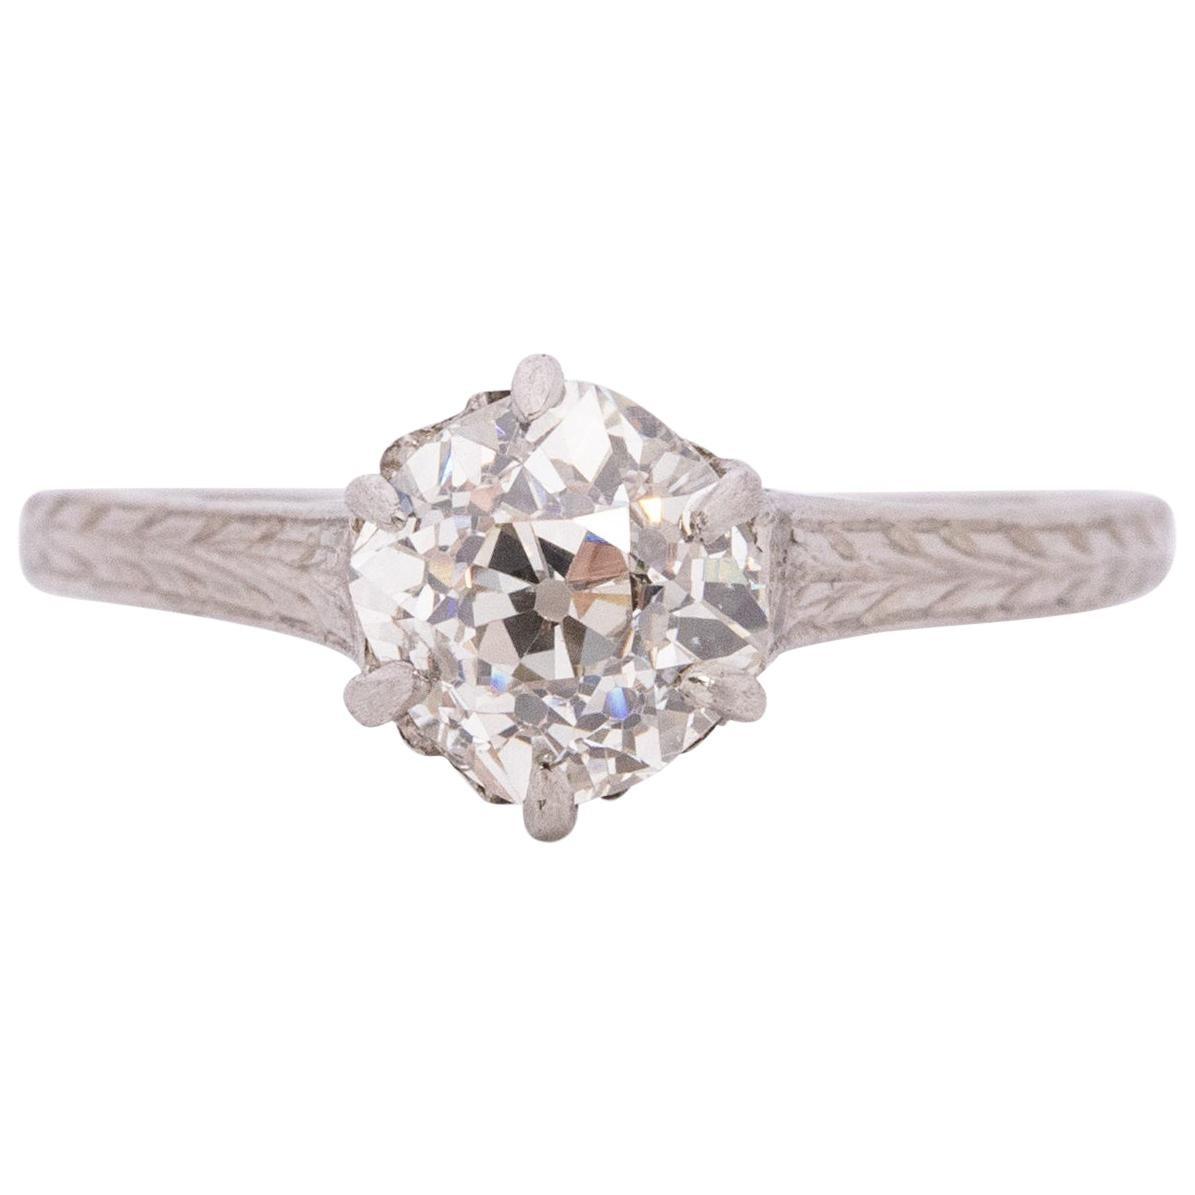 Edwardian Platinum 1.0 Carat Solitaire Diamond Cathedral Shank Engagement Ring